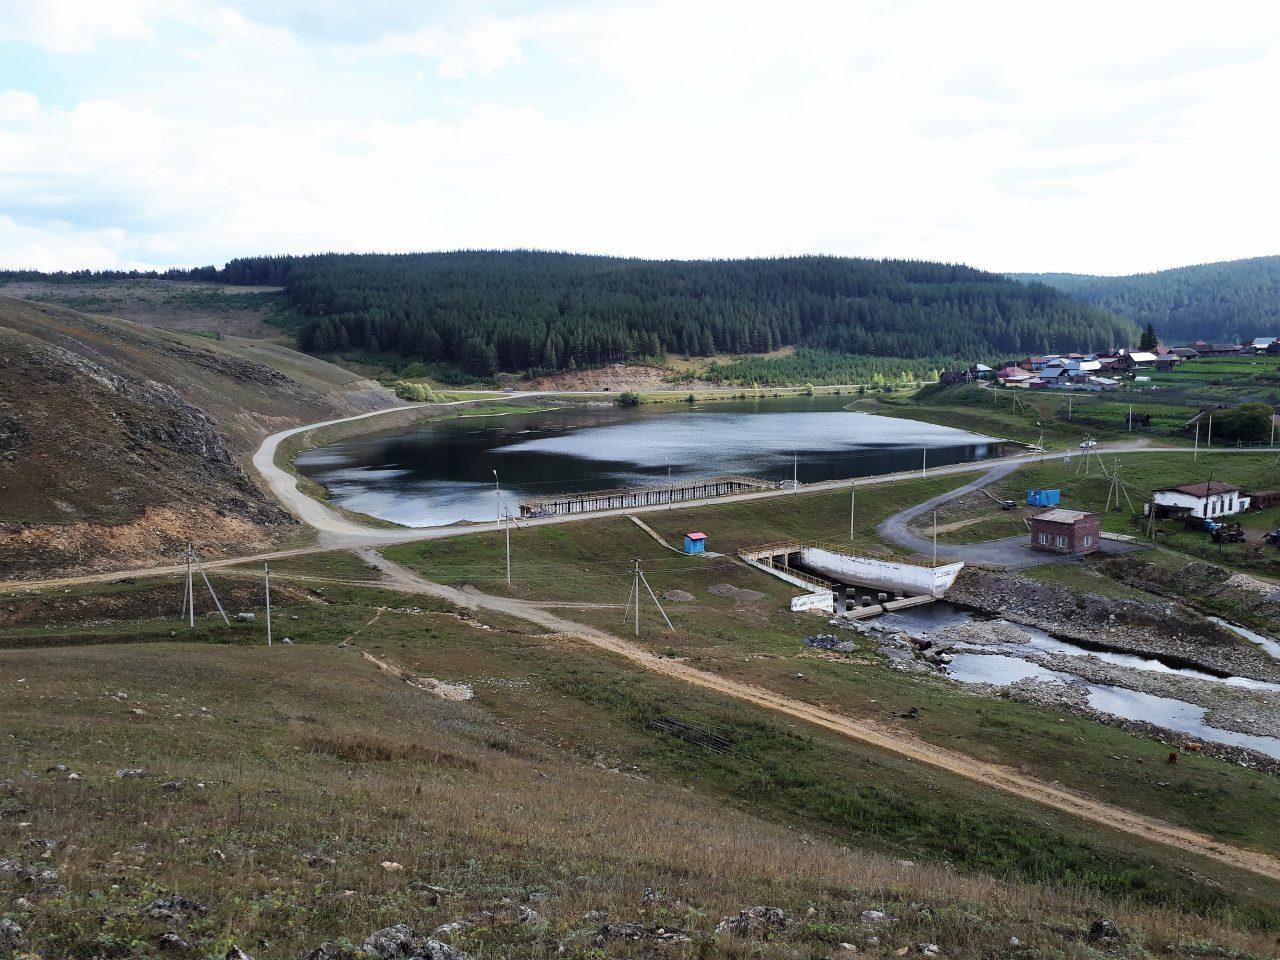 Село Кага, Белорецкий район, Башкортостан, Башкирия